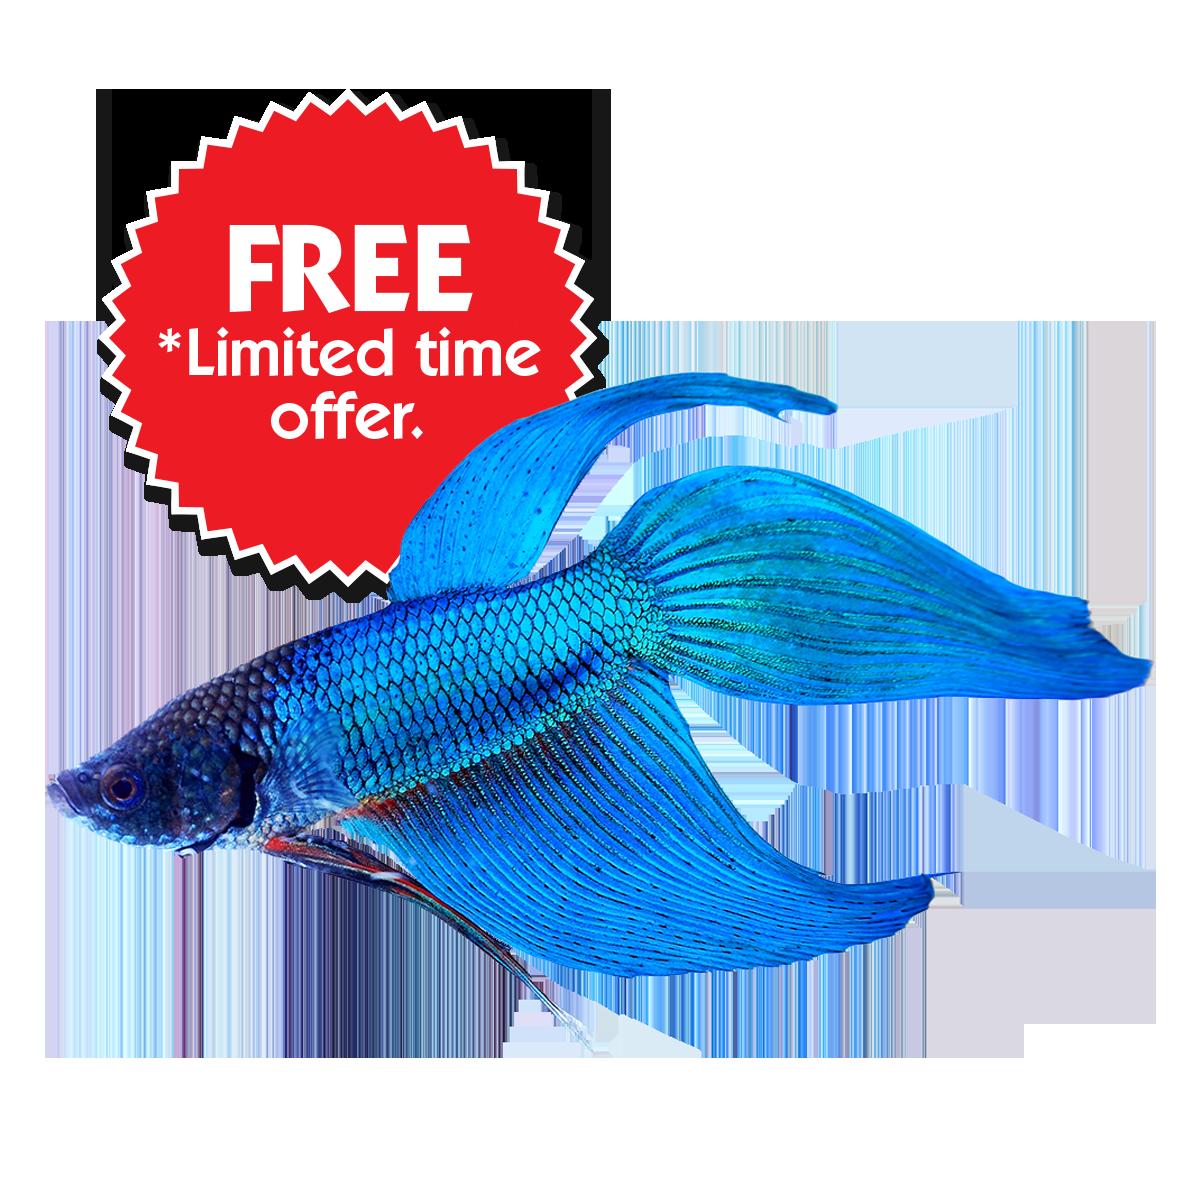 Betta fish clipart royalty free stock Buy Betta Fish Online & Save On Fish Bowl Kits | Home | GoBetta royalty free stock